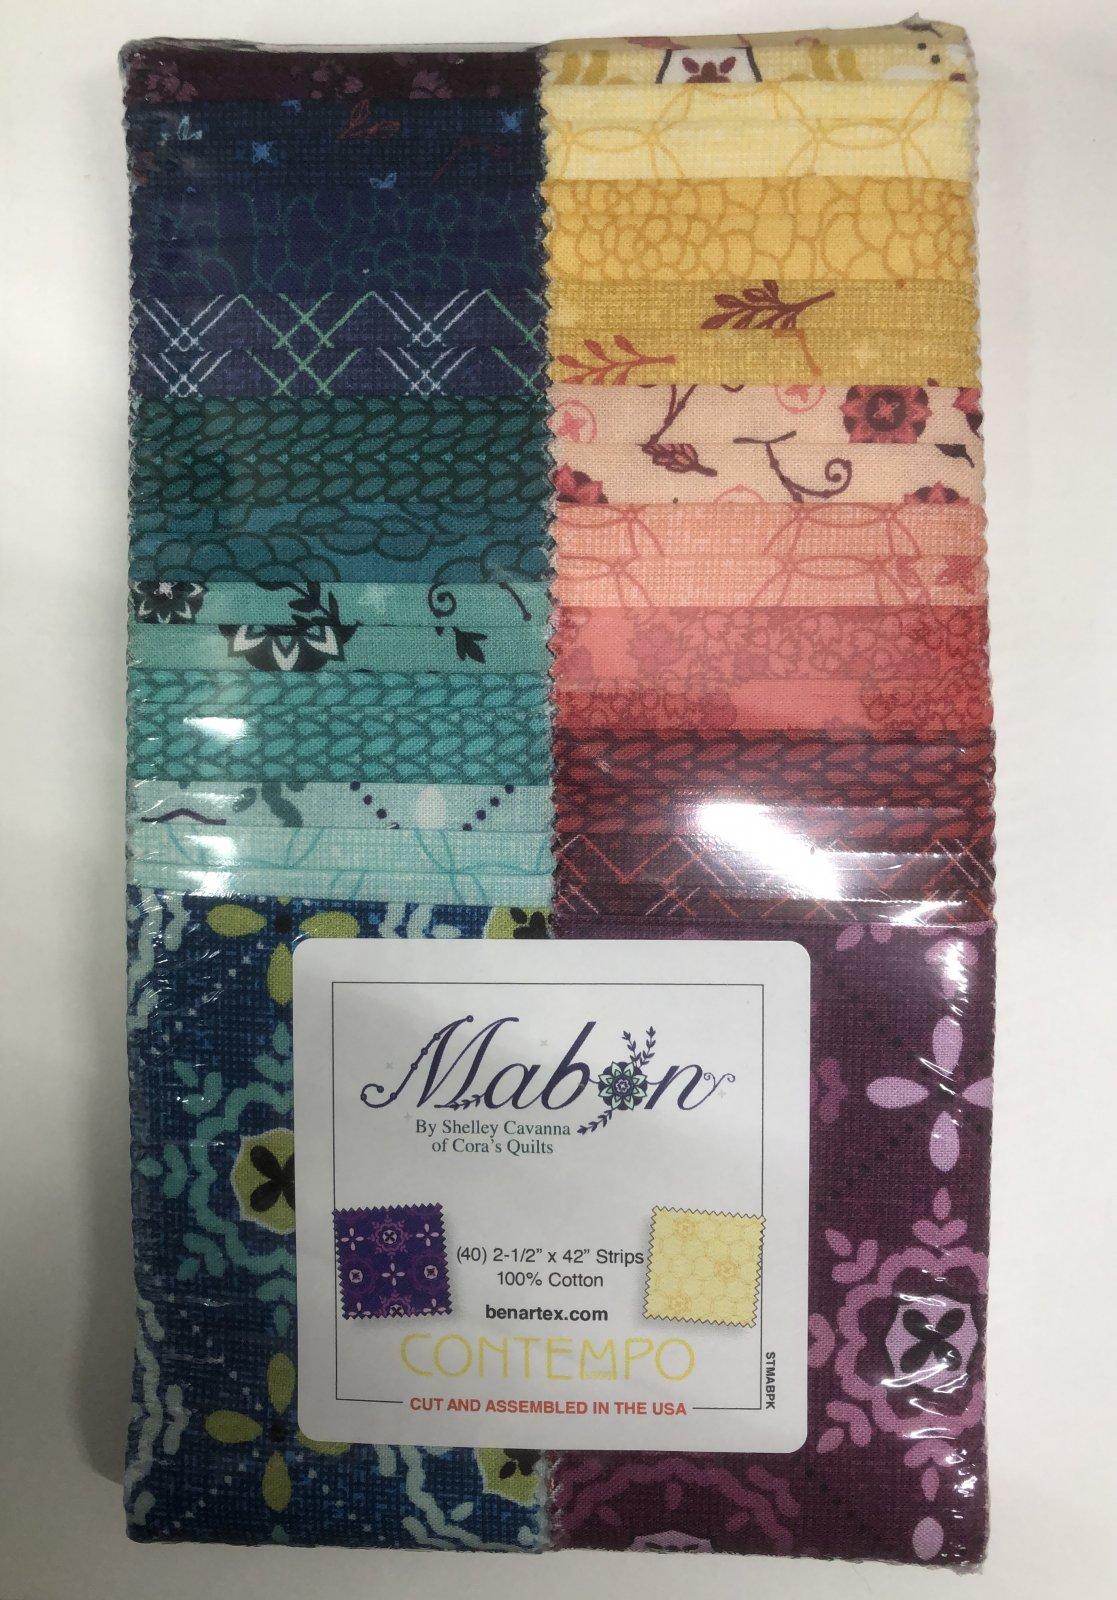 2.5 inch STRIPS:  Mabon by Benartex - 40 piece 2.5 inch Fabric Strips Flat Pack